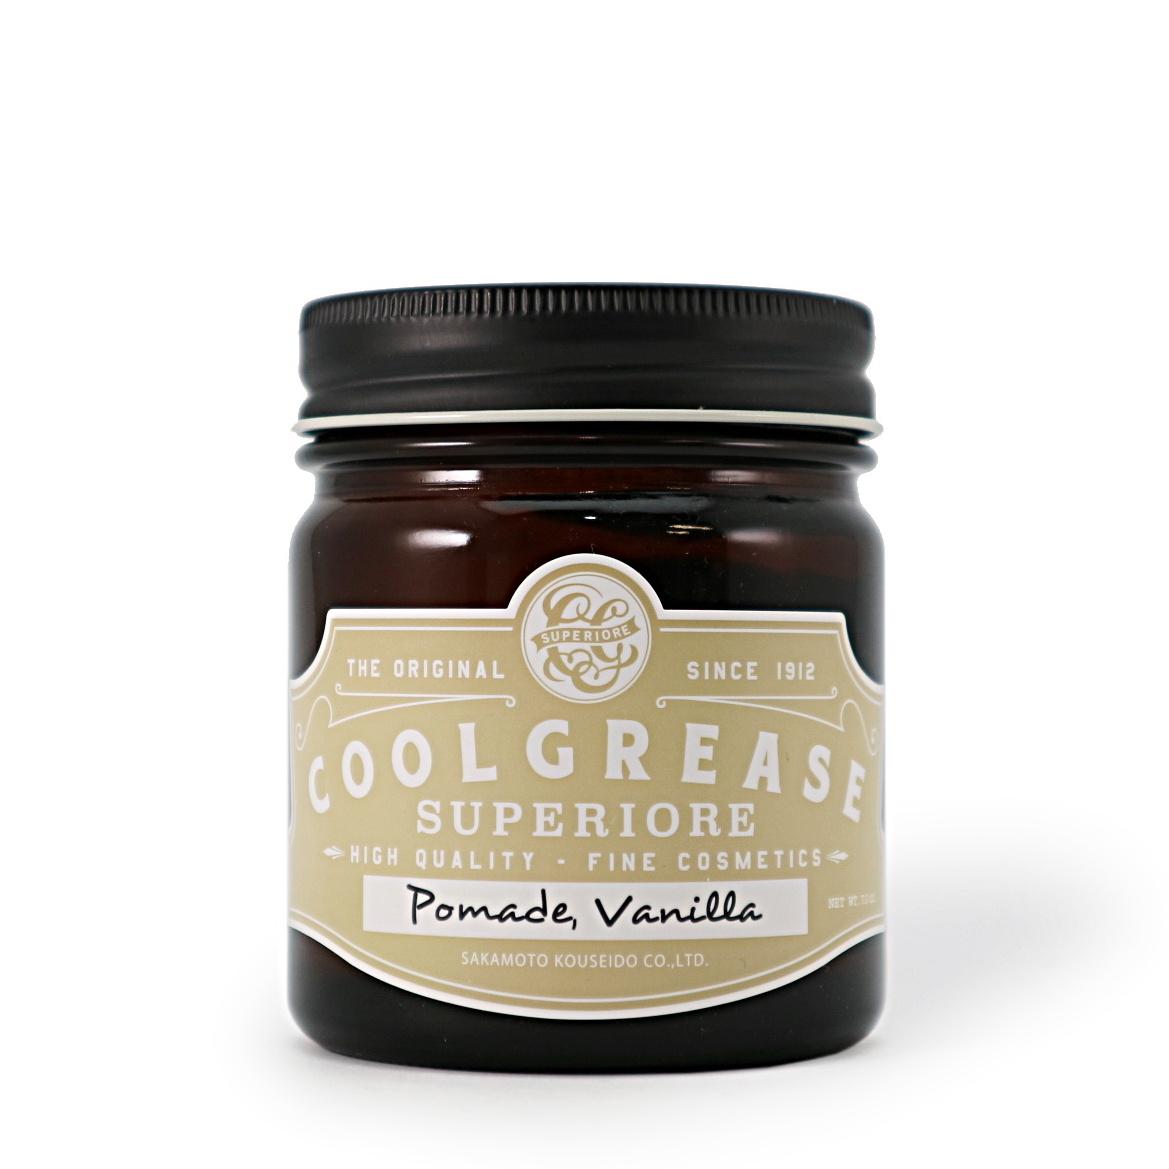 POMADE VANILLA/COOL GREASE SUPERIORE(ポマード)